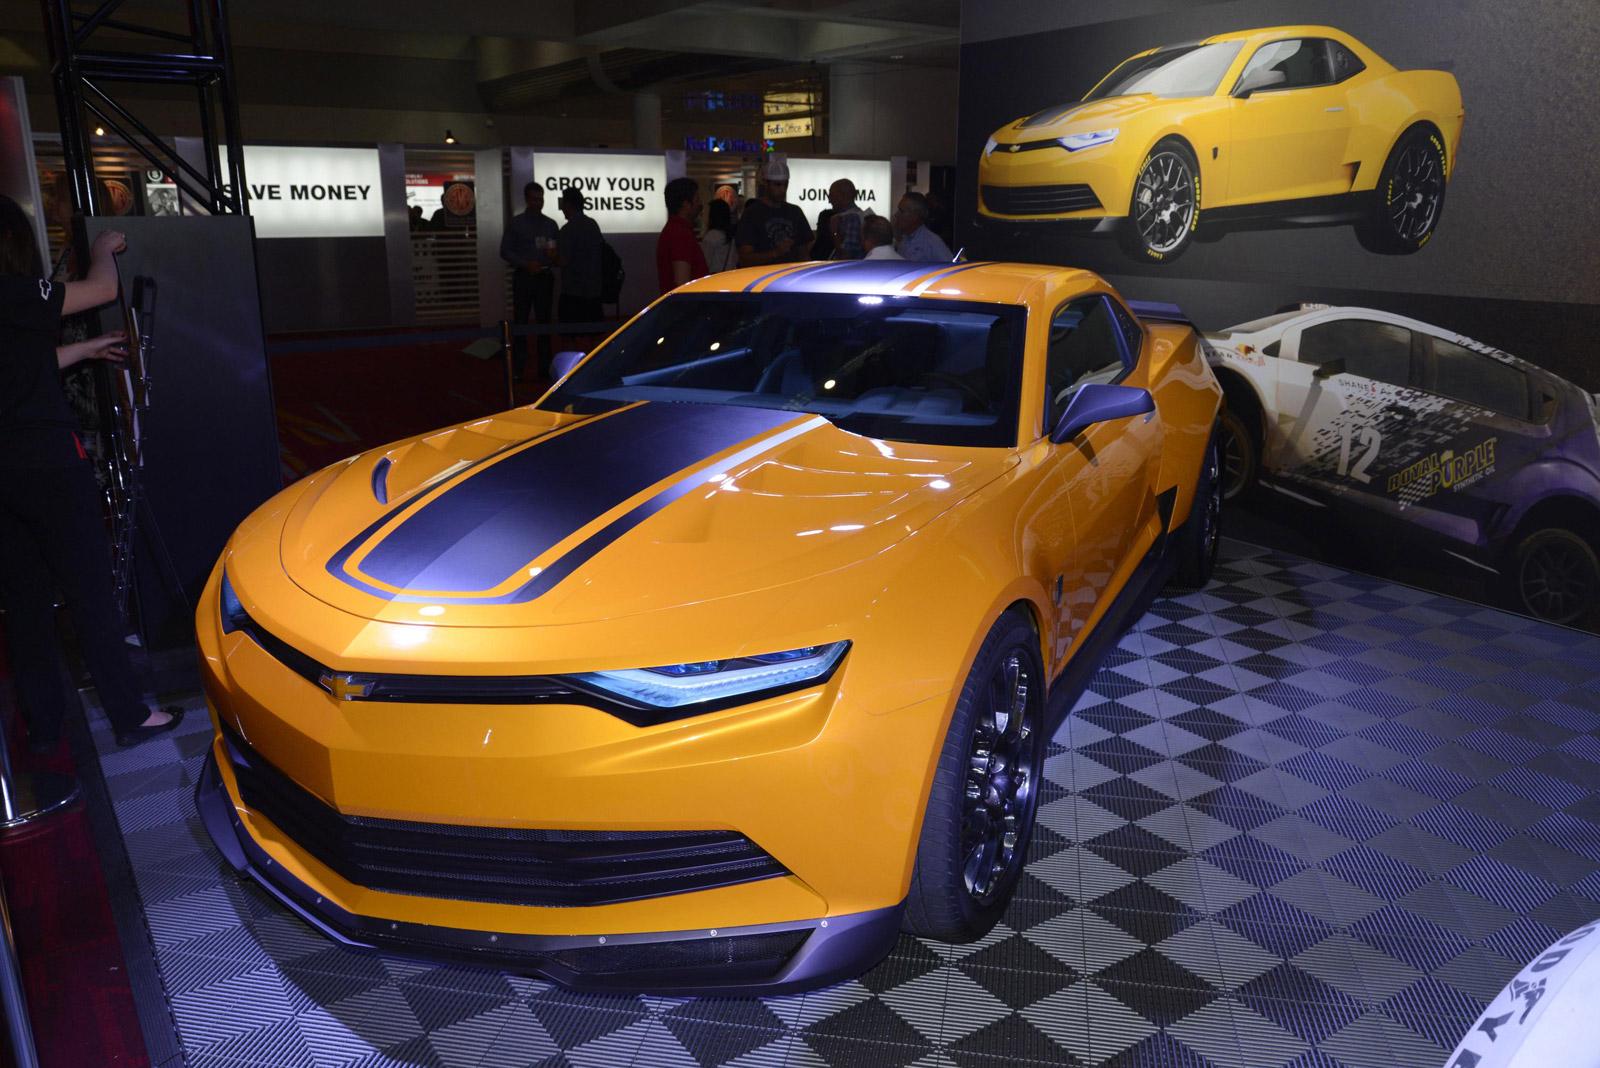 transformers 4 camaro concept and corvette stingray make sema showing. Black Bedroom Furniture Sets. Home Design Ideas